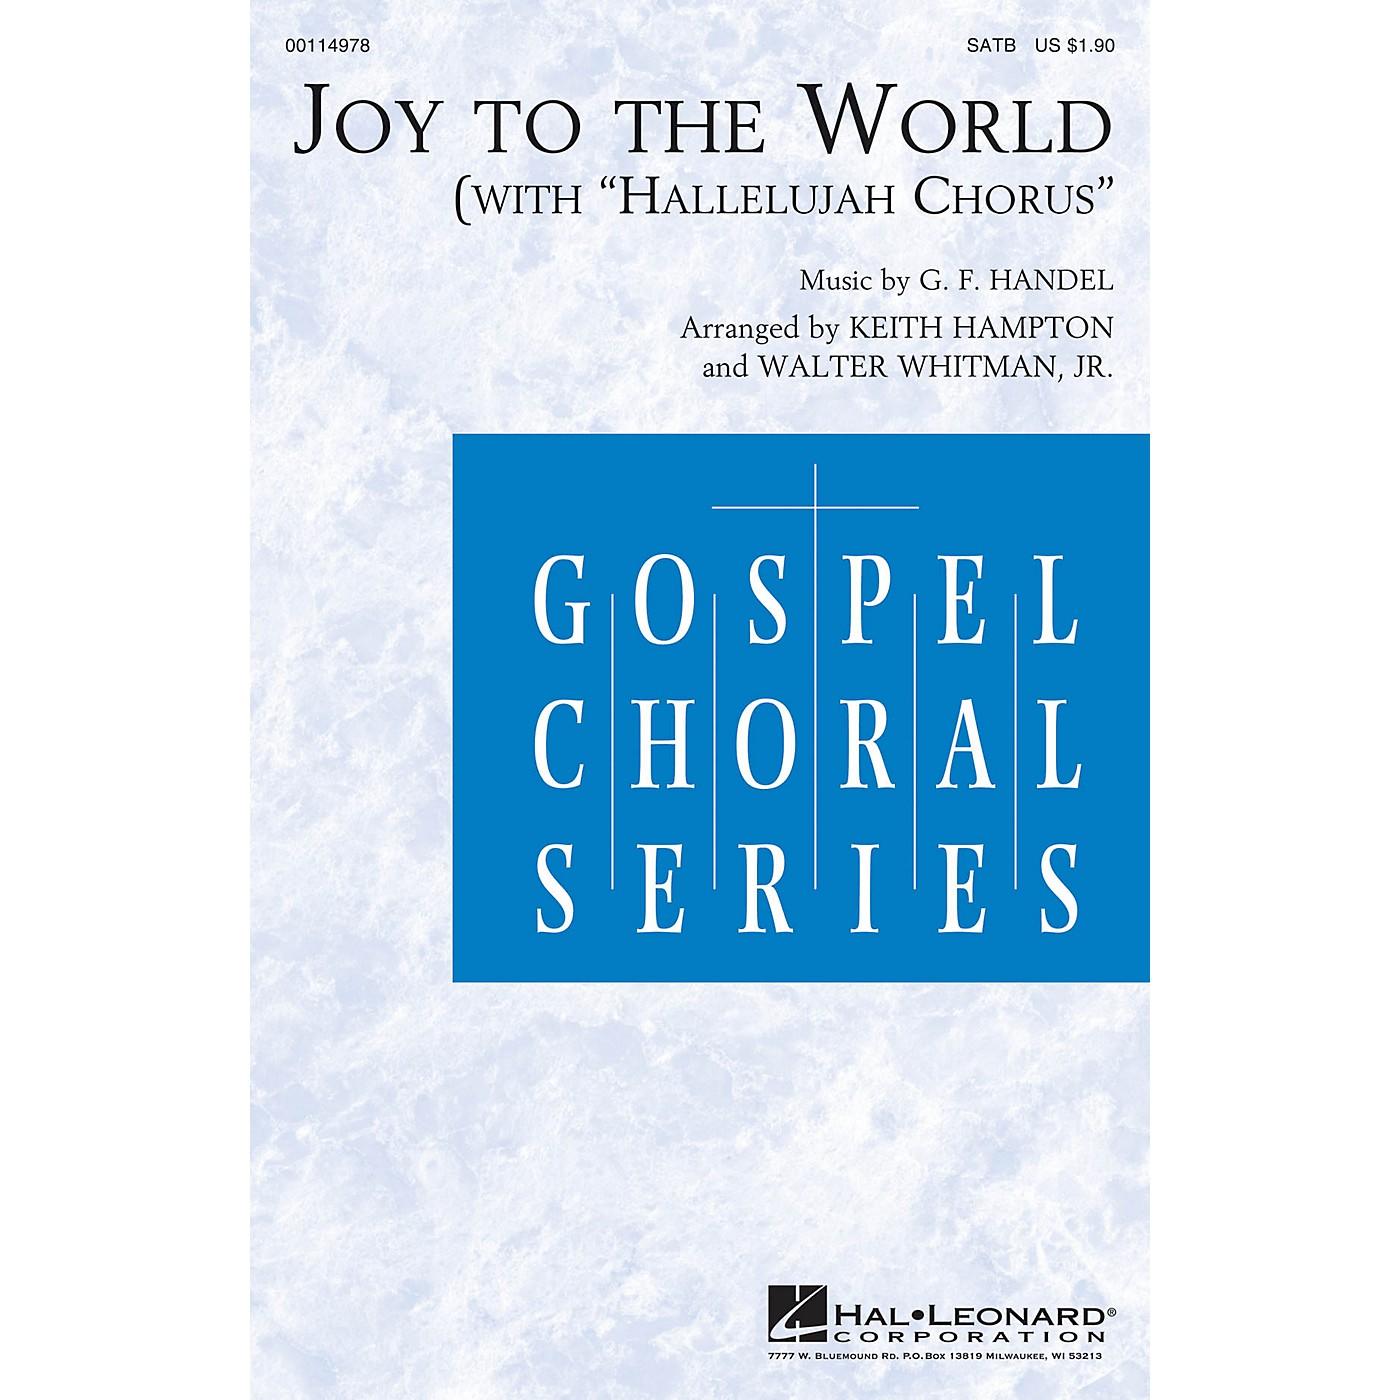 Hal Leonard Joy to the World (with Hallelujah Chorus) SATB arranged by Keith Hampton thumbnail